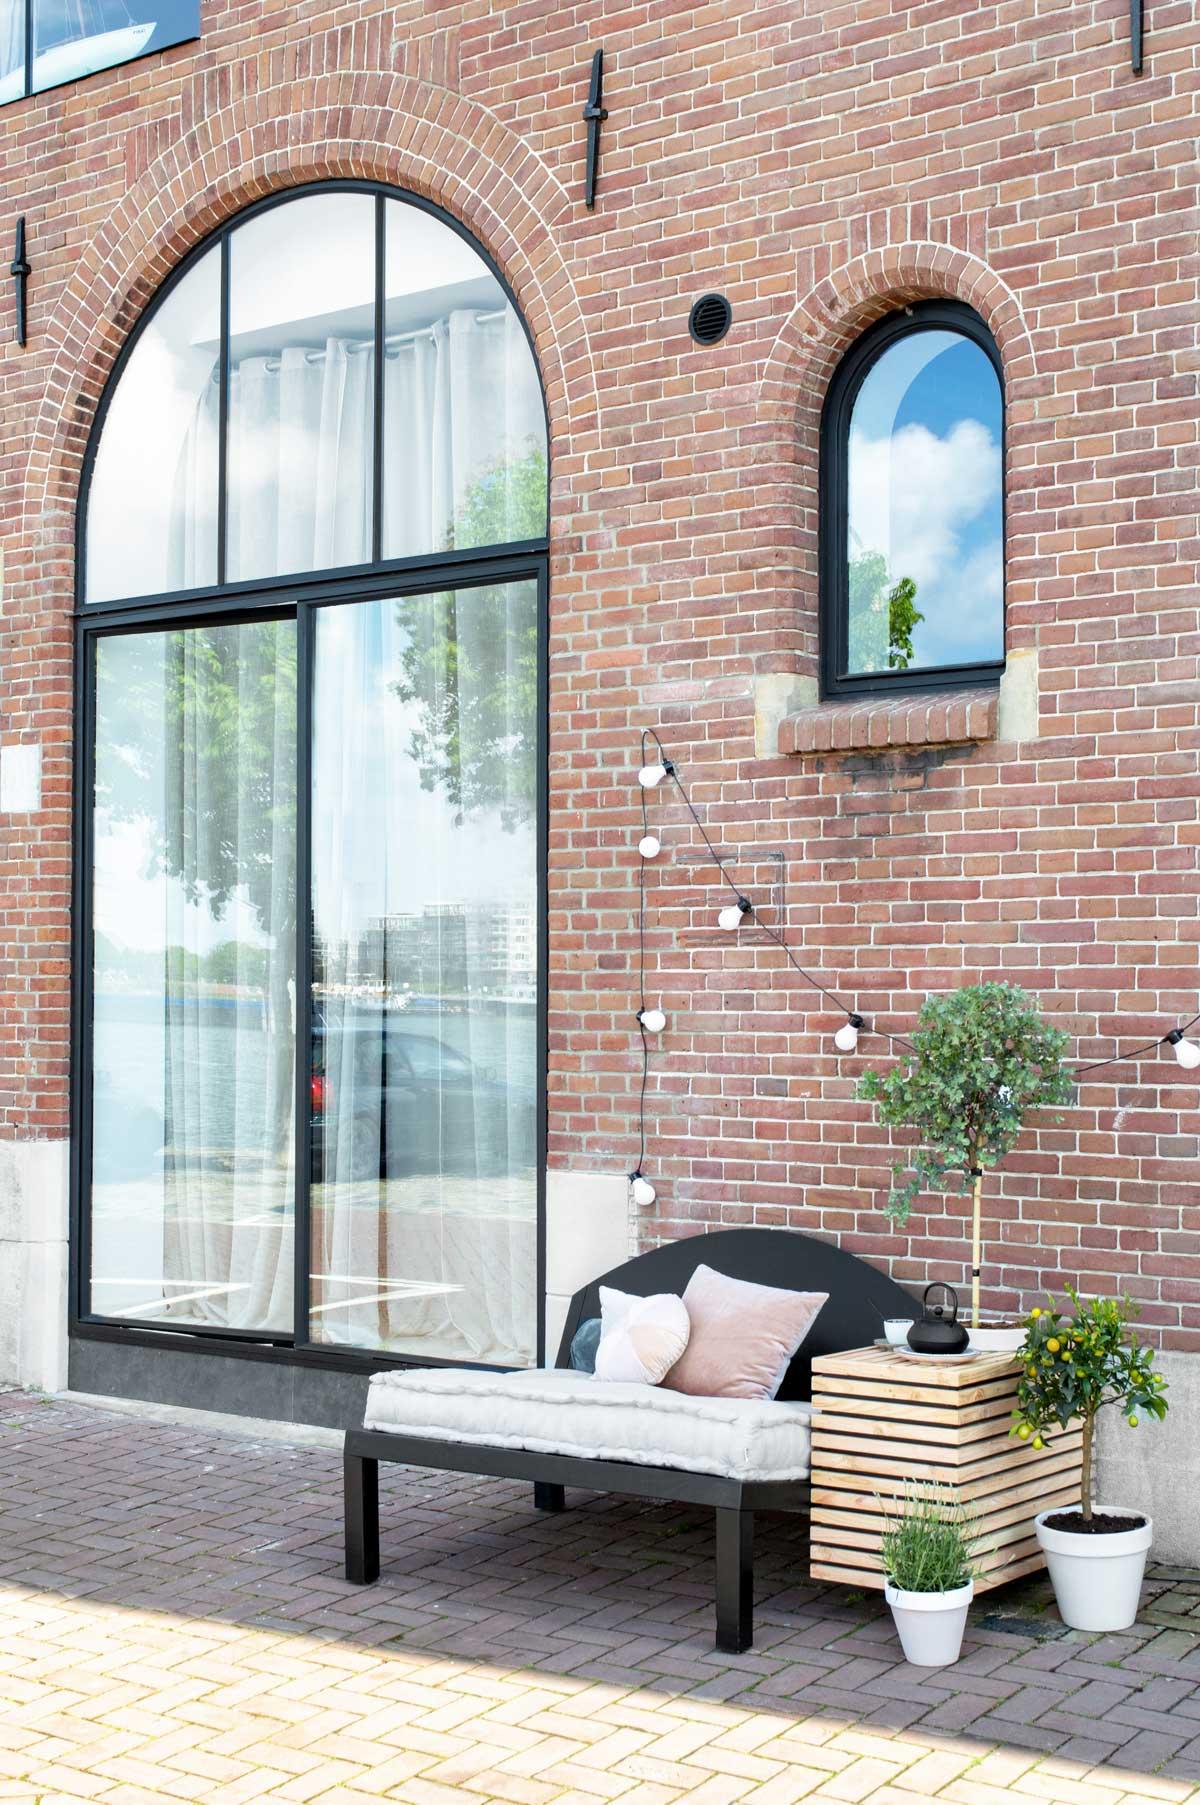 DIY tuinbank voor buiten - Tanja van Hoogdalem